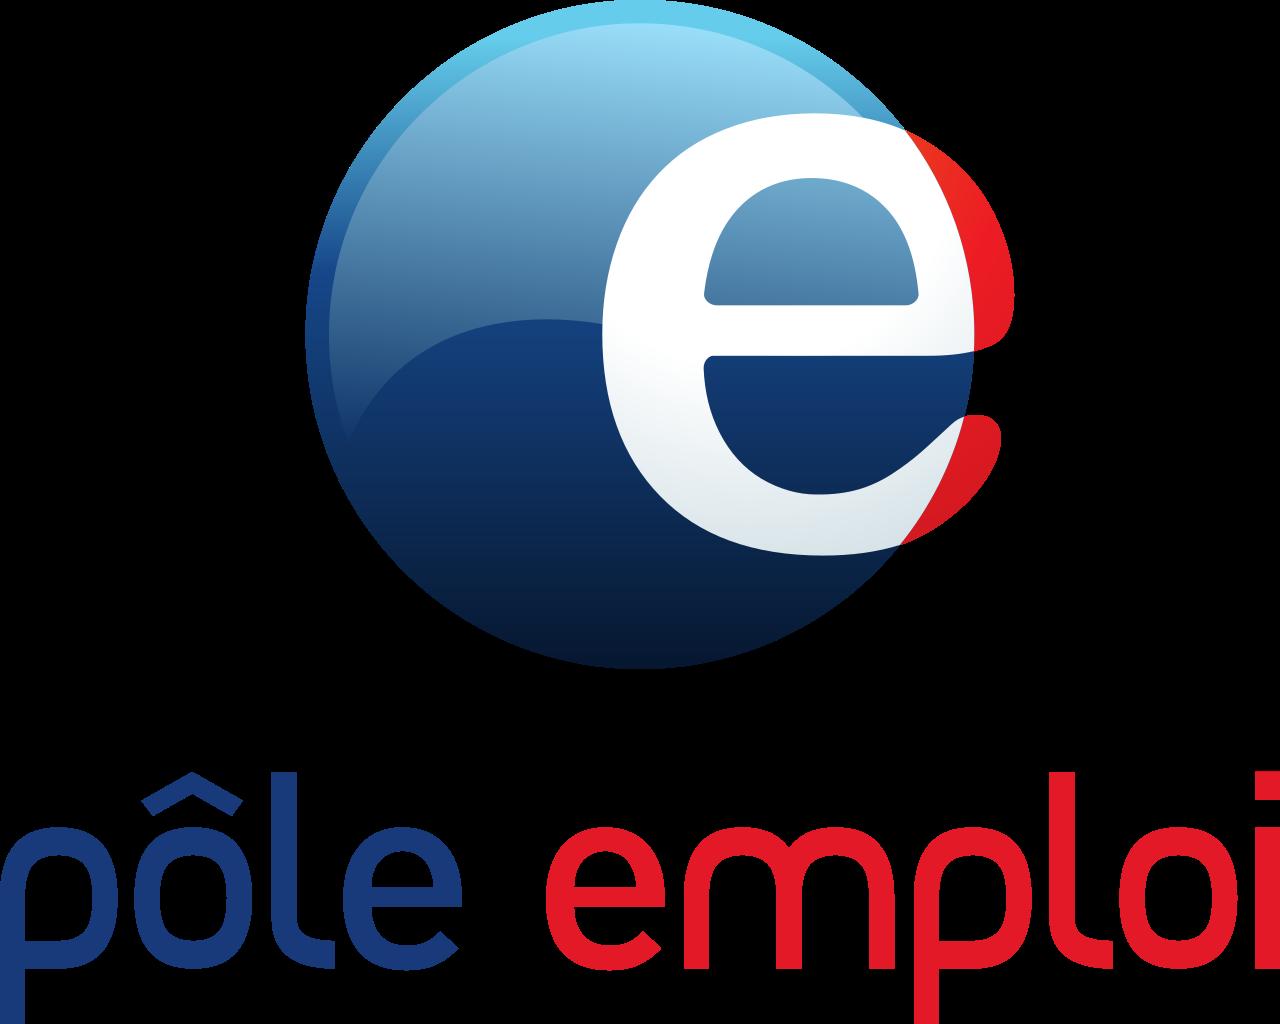 1280px logo pole emploi 2008svg